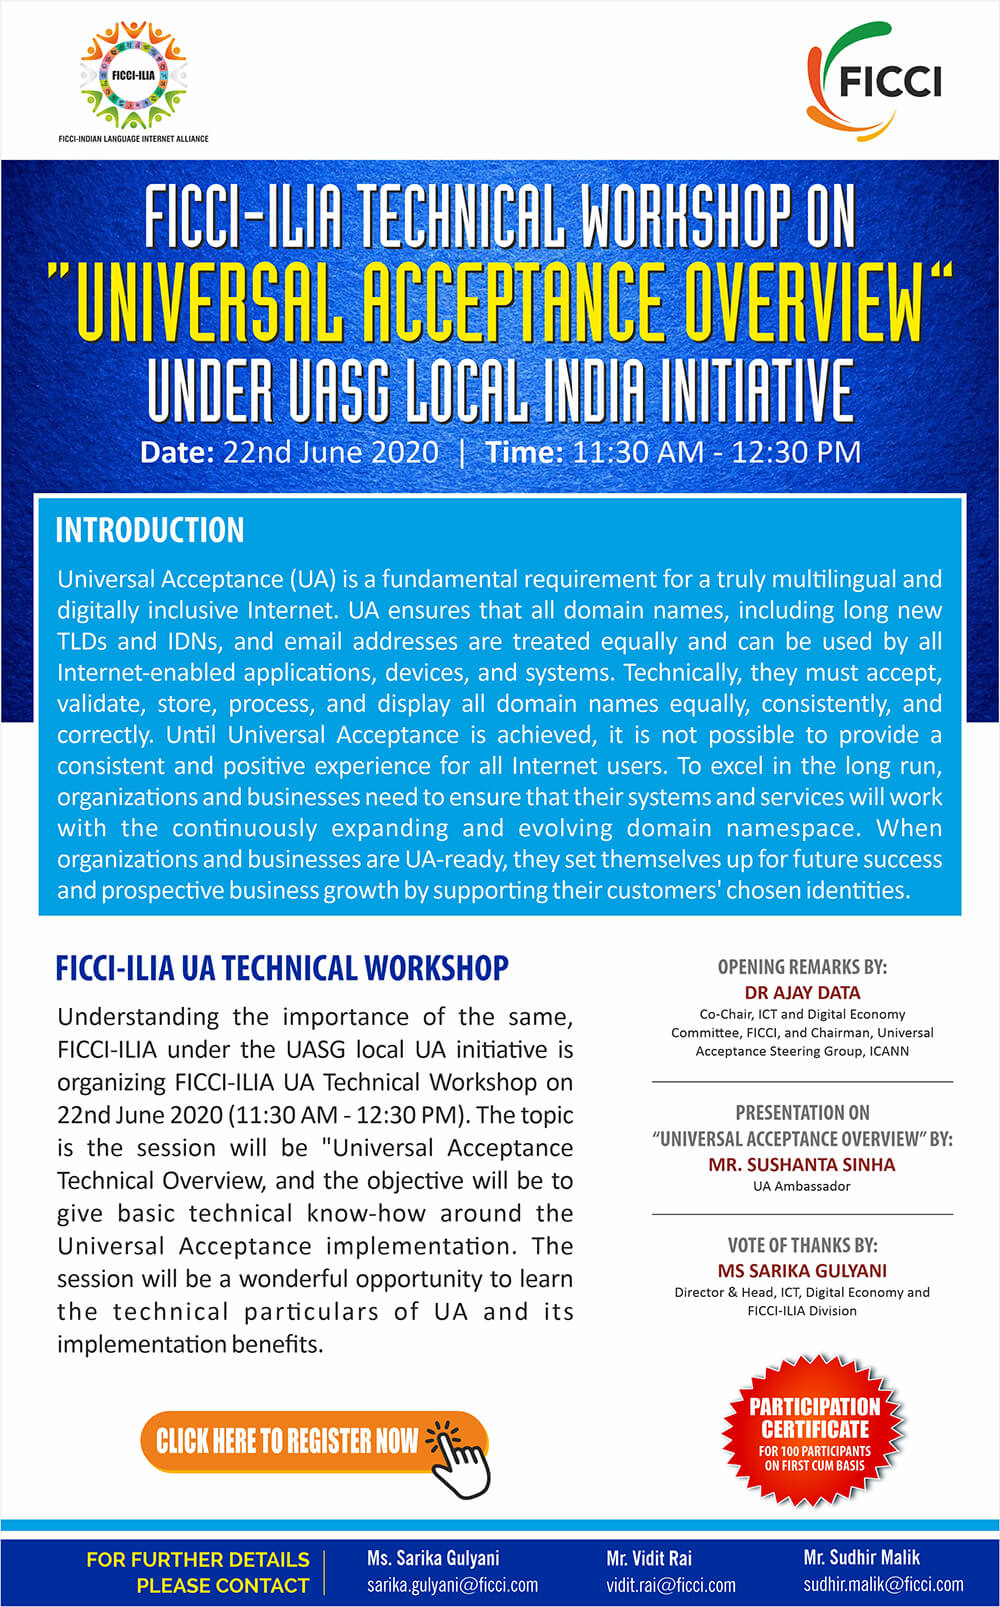 FICCI-ILIA Technical Workshop